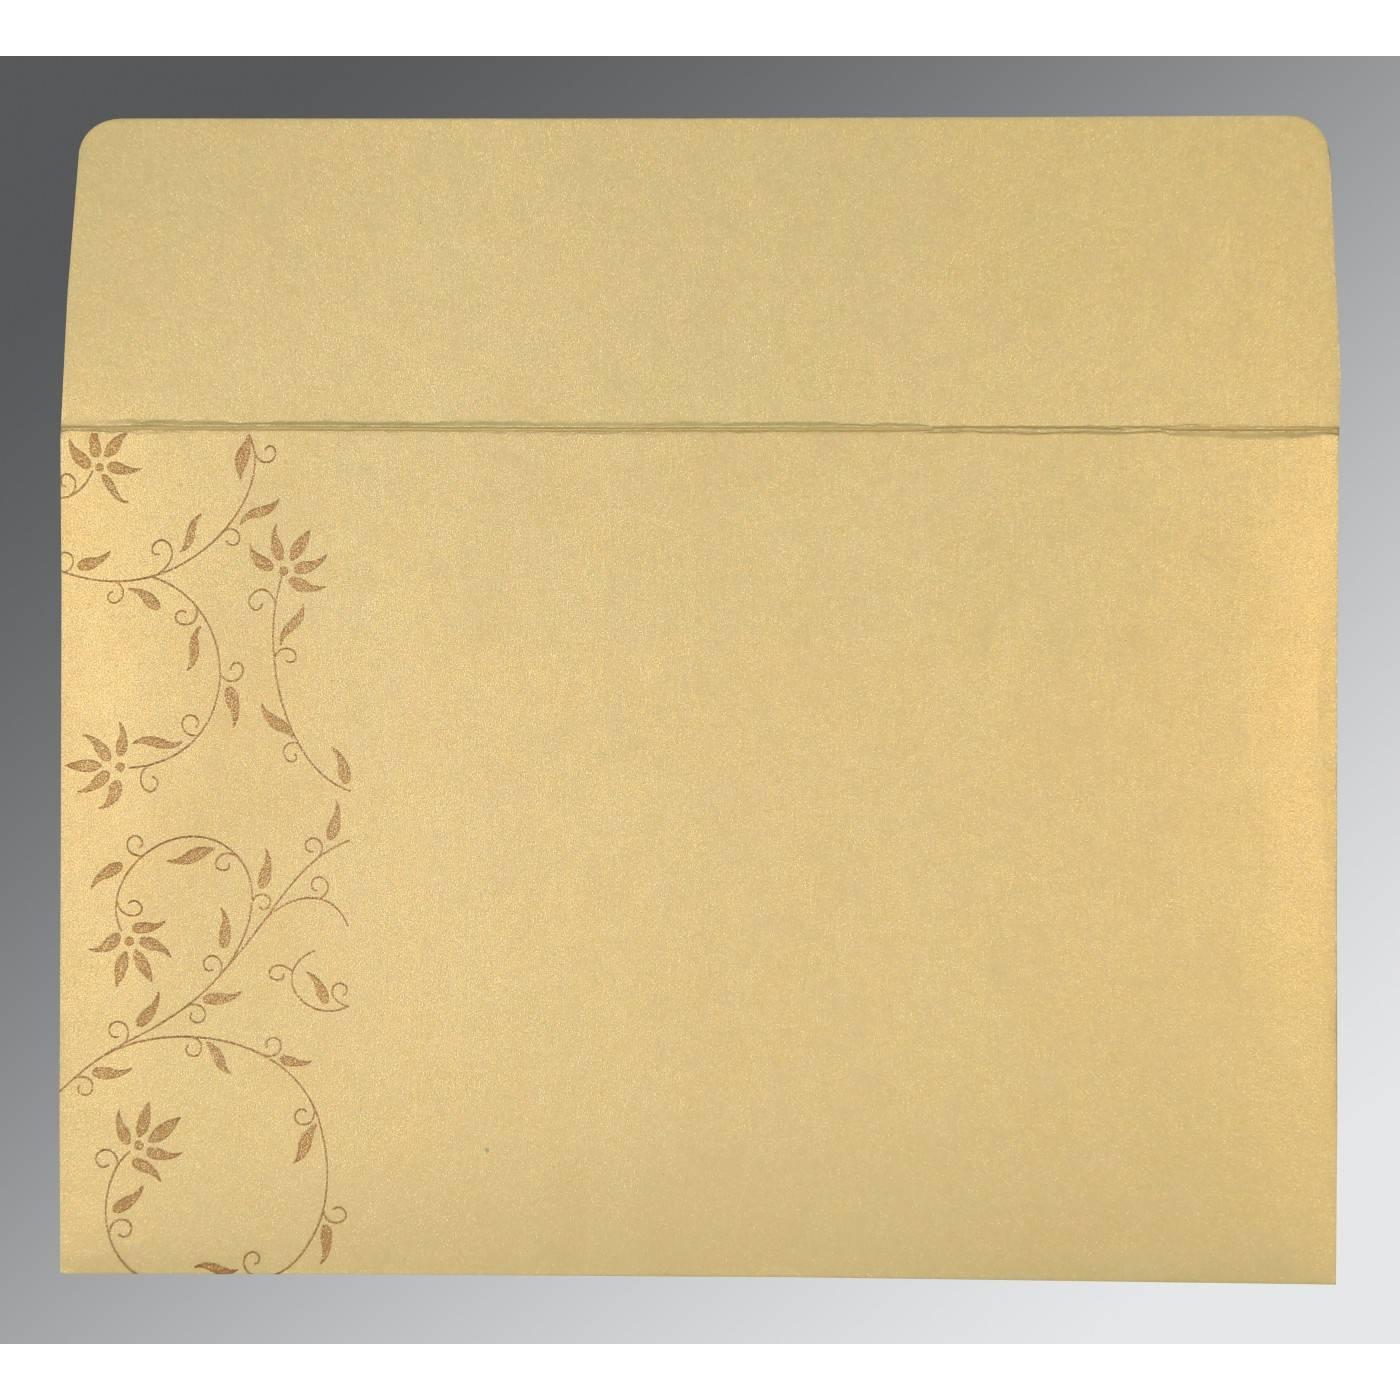 CREAM SHIMMERY FLORAL THEMED - SCREEN PRINTED WEDDING INVITATION : CG-8226S - IndianWeddingCards